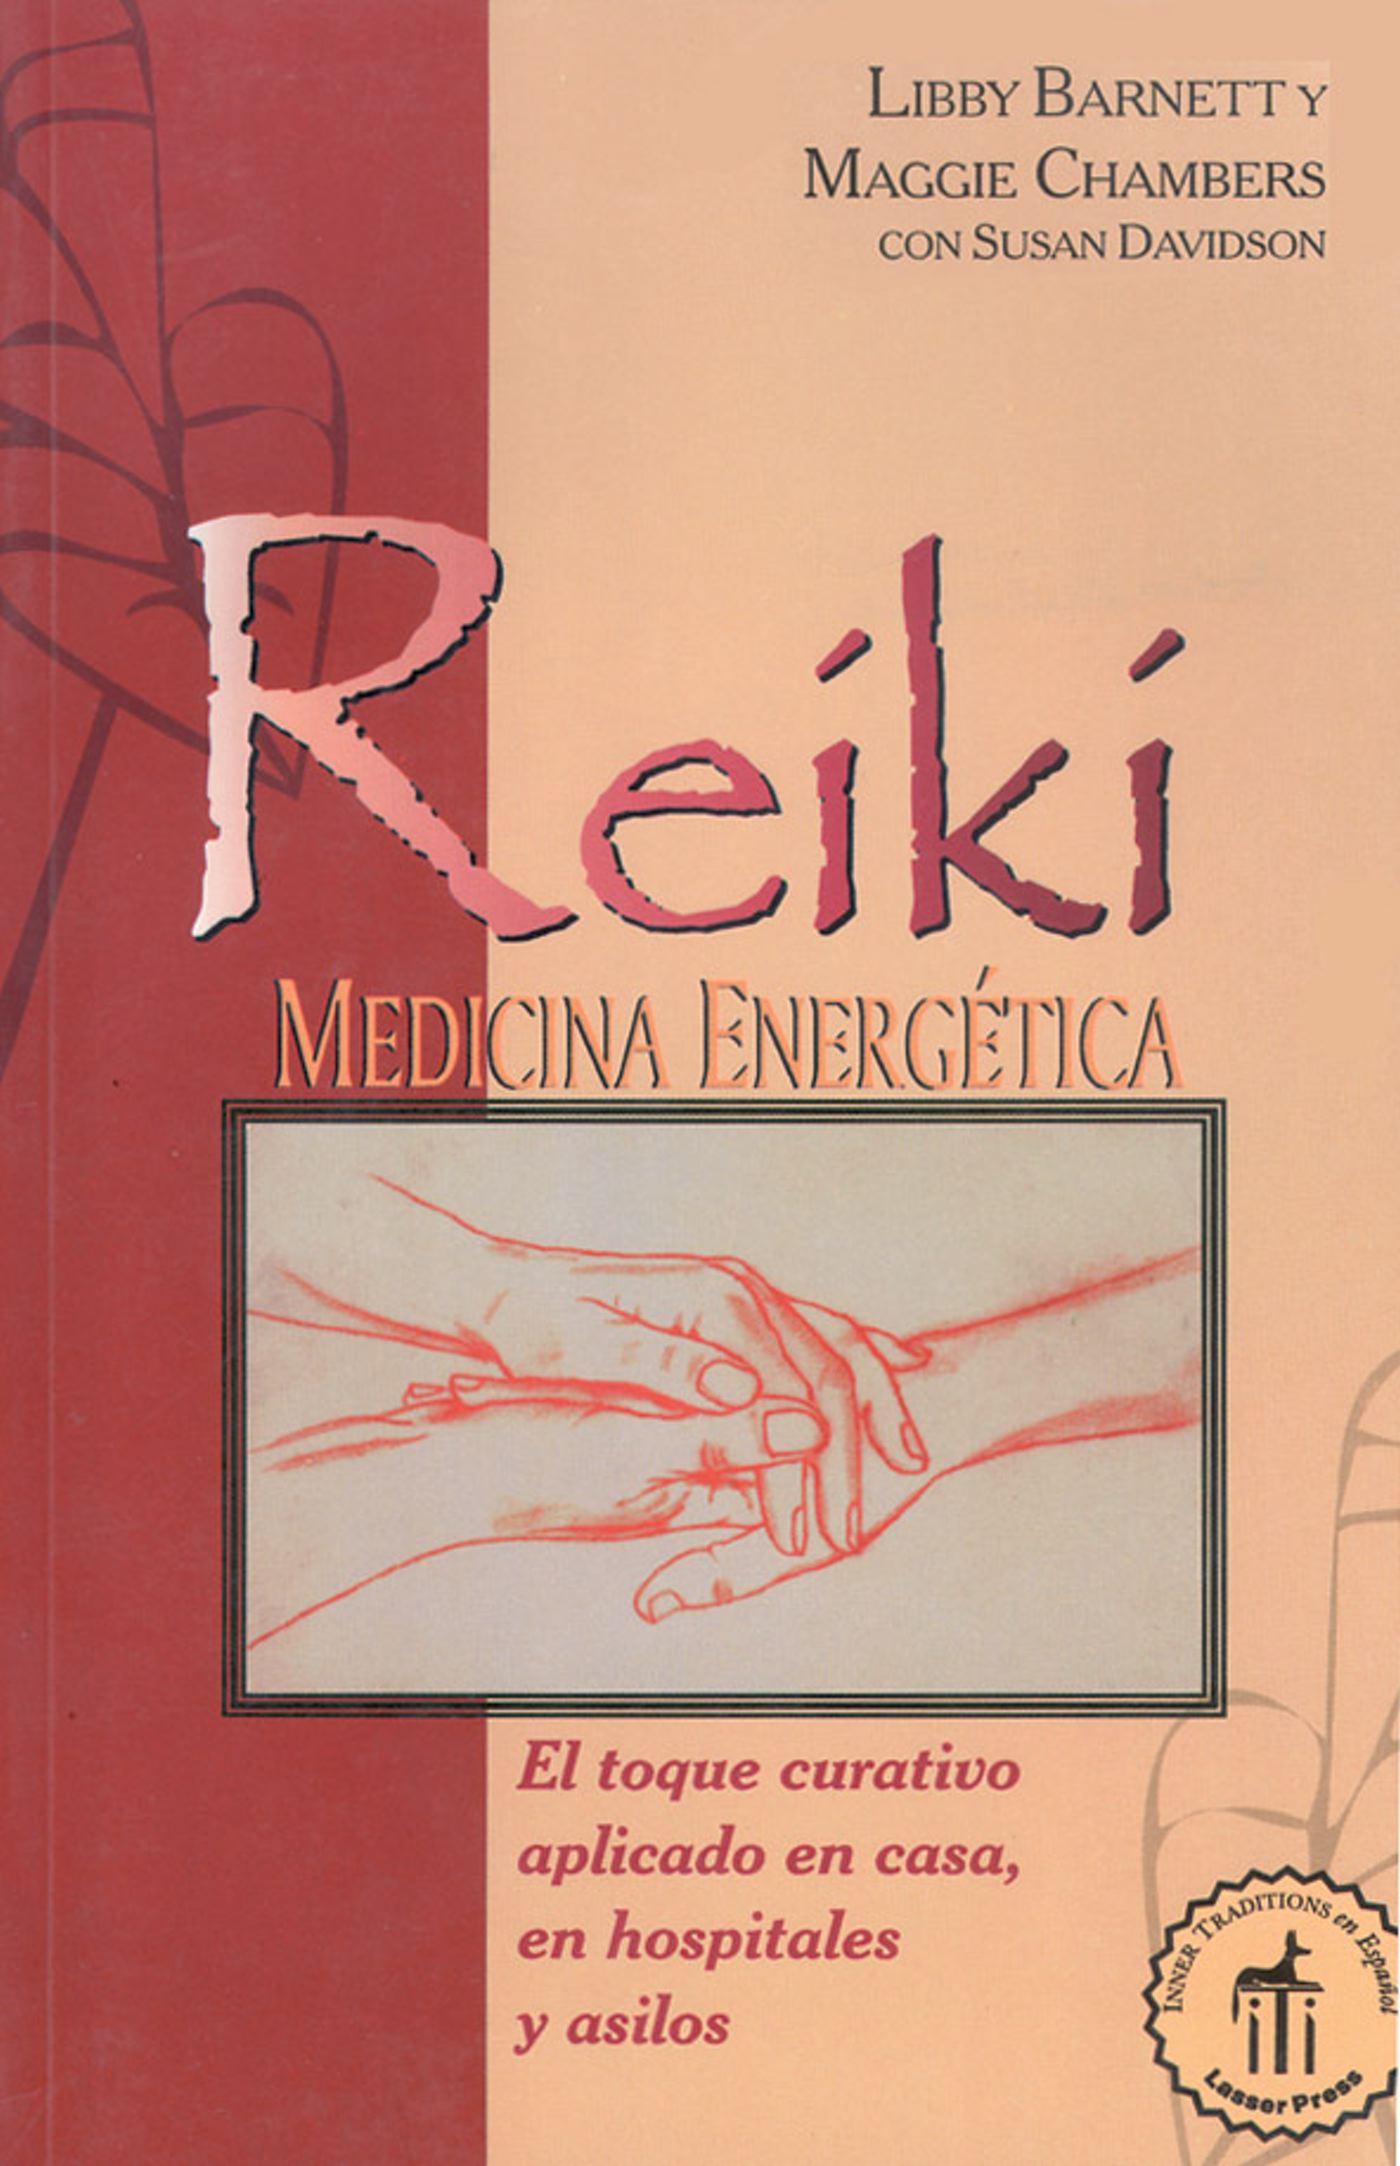 Reiki medicina energetica 9780892815944 hr